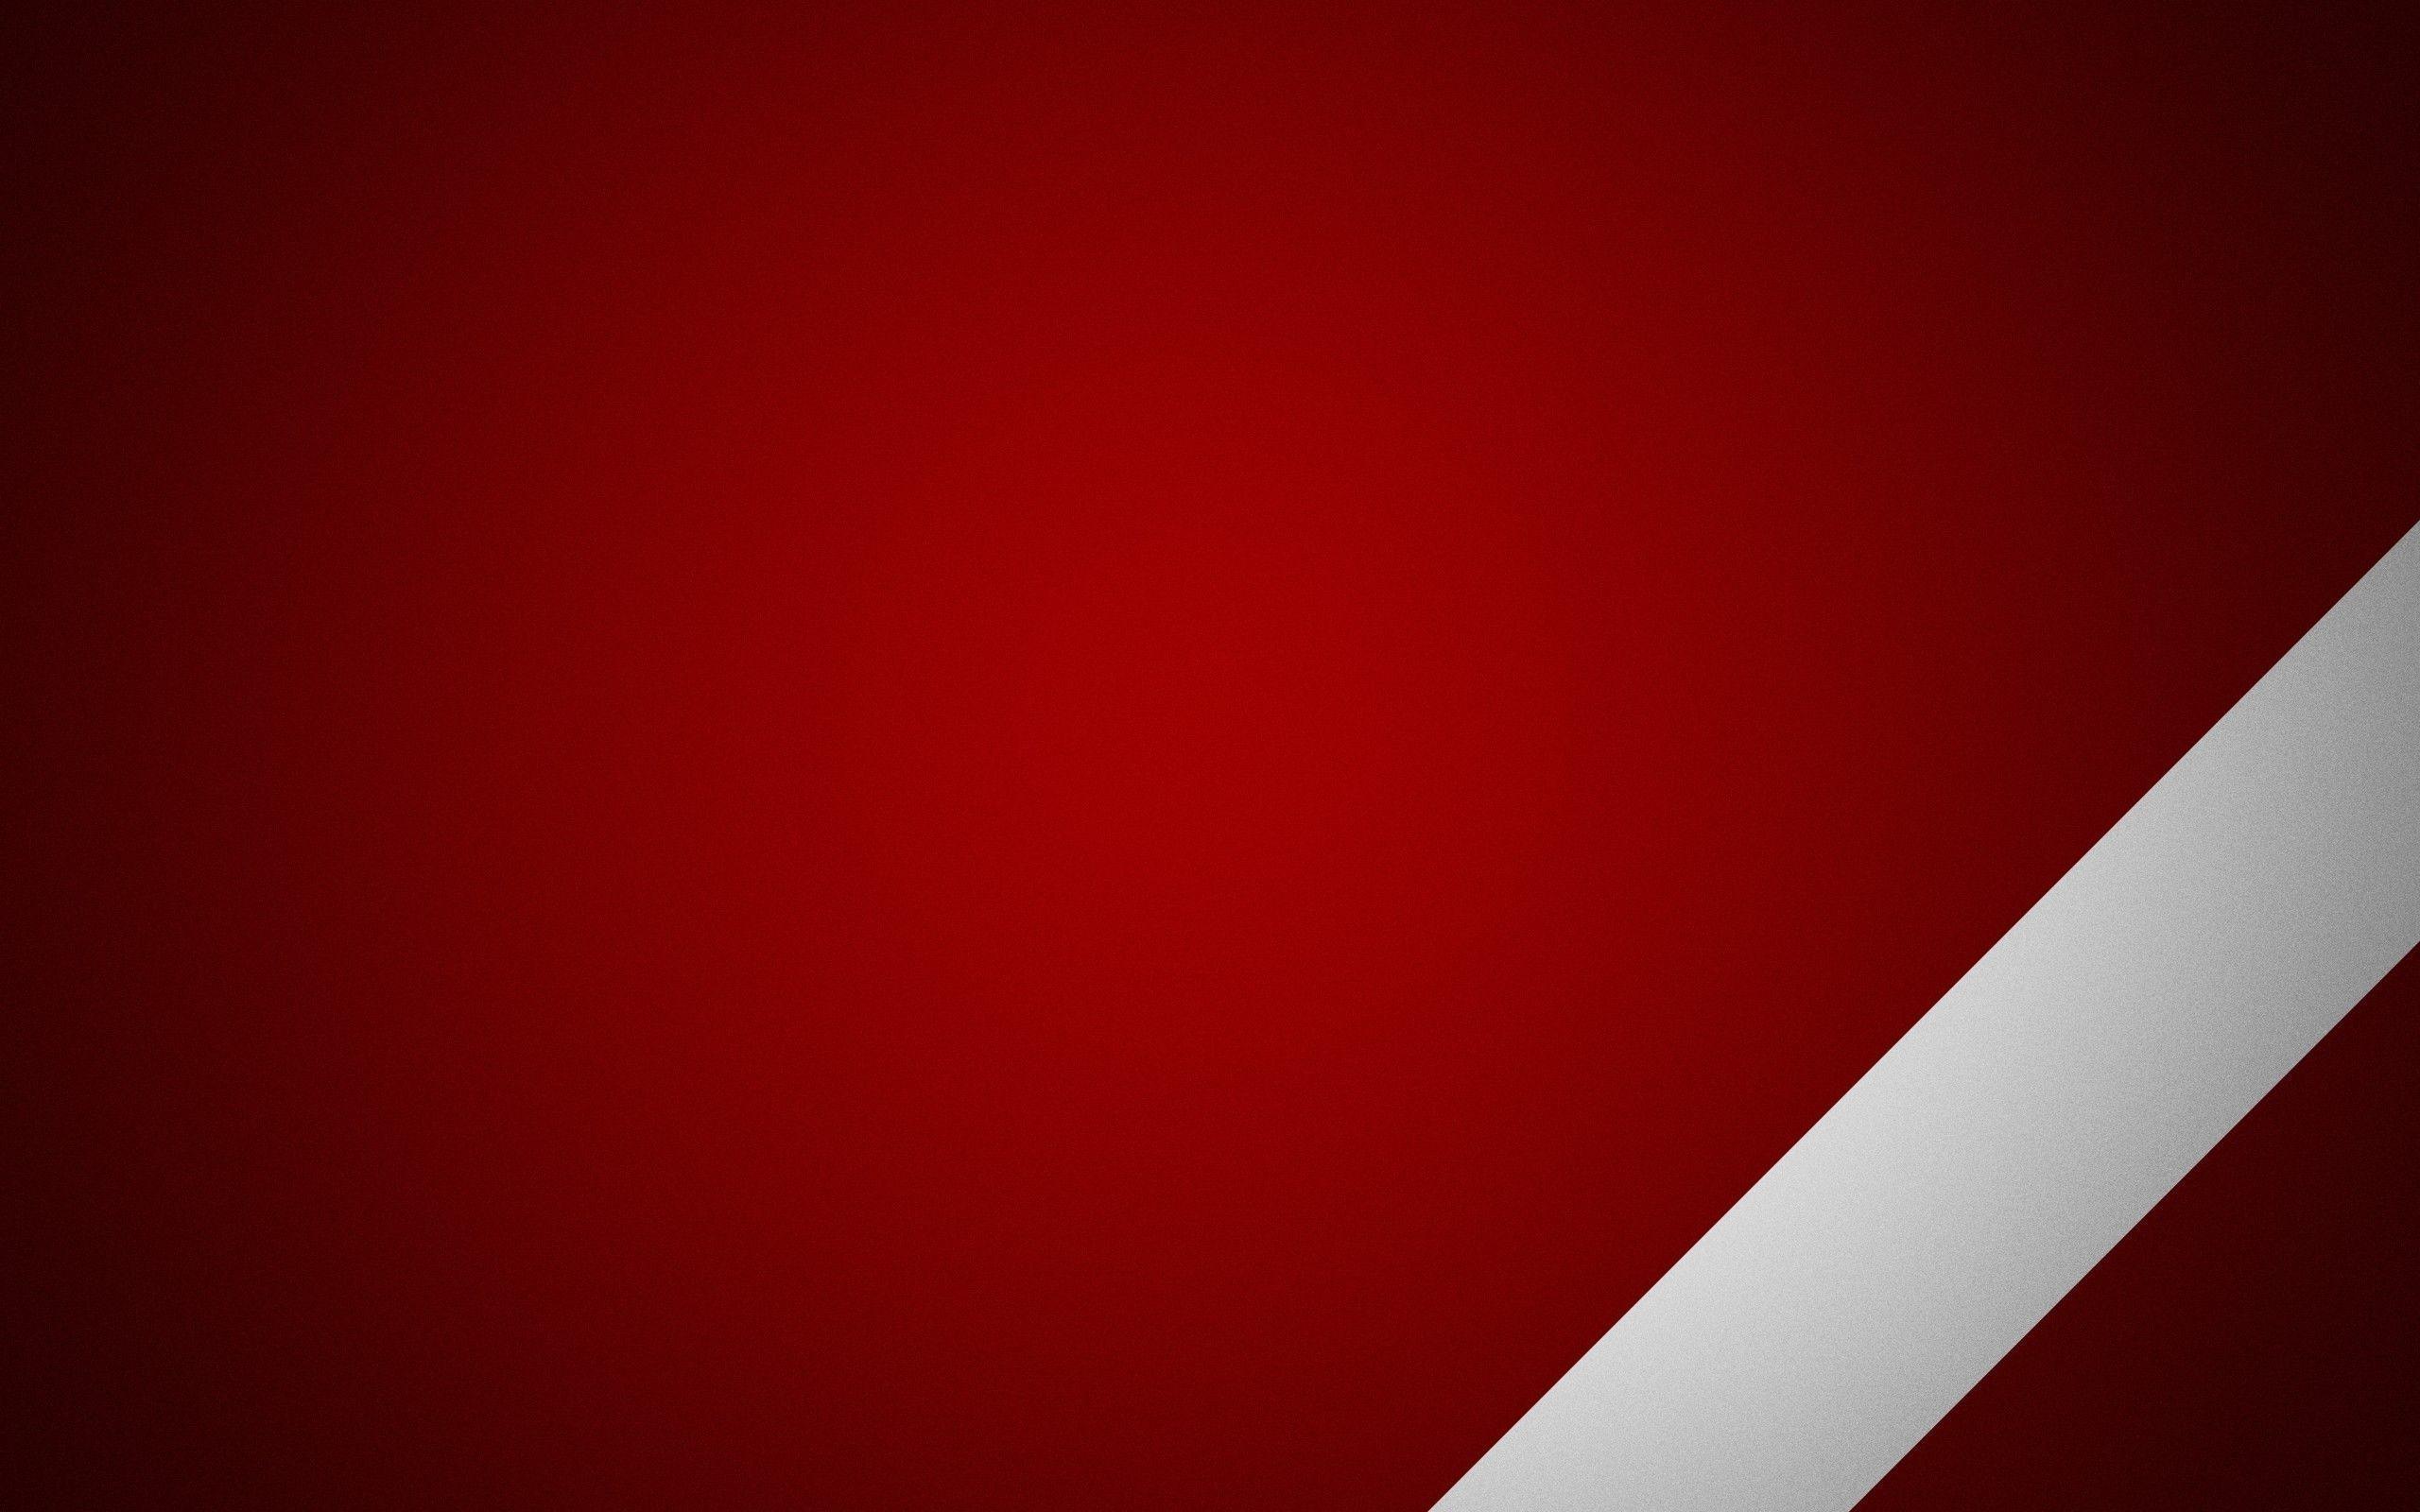 White Stripe On Red Background Wallpaper